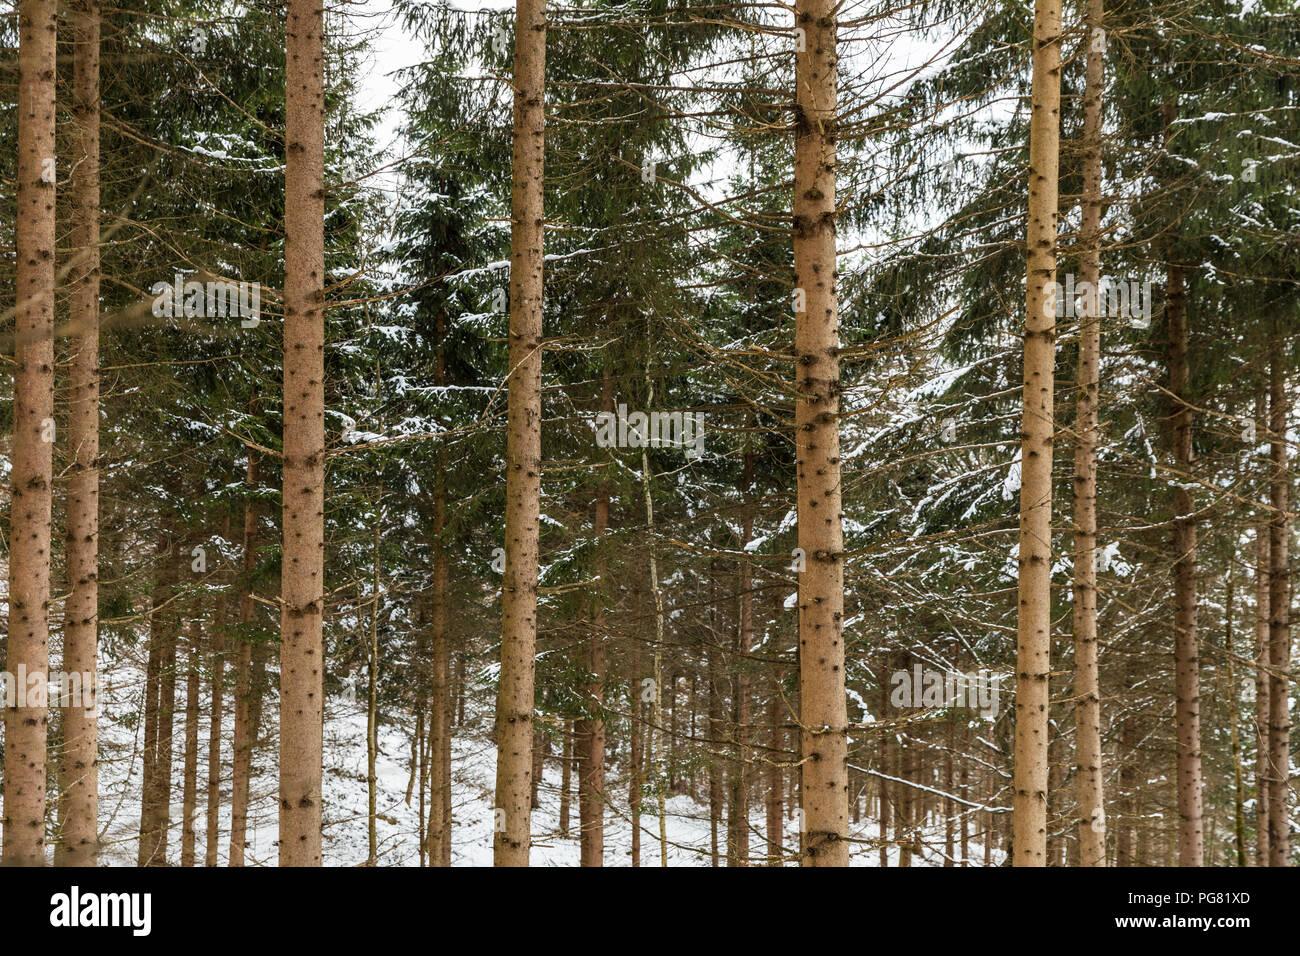 Austria Innsbruck Forest Of Snow Covered Fir Trees Stock Photo